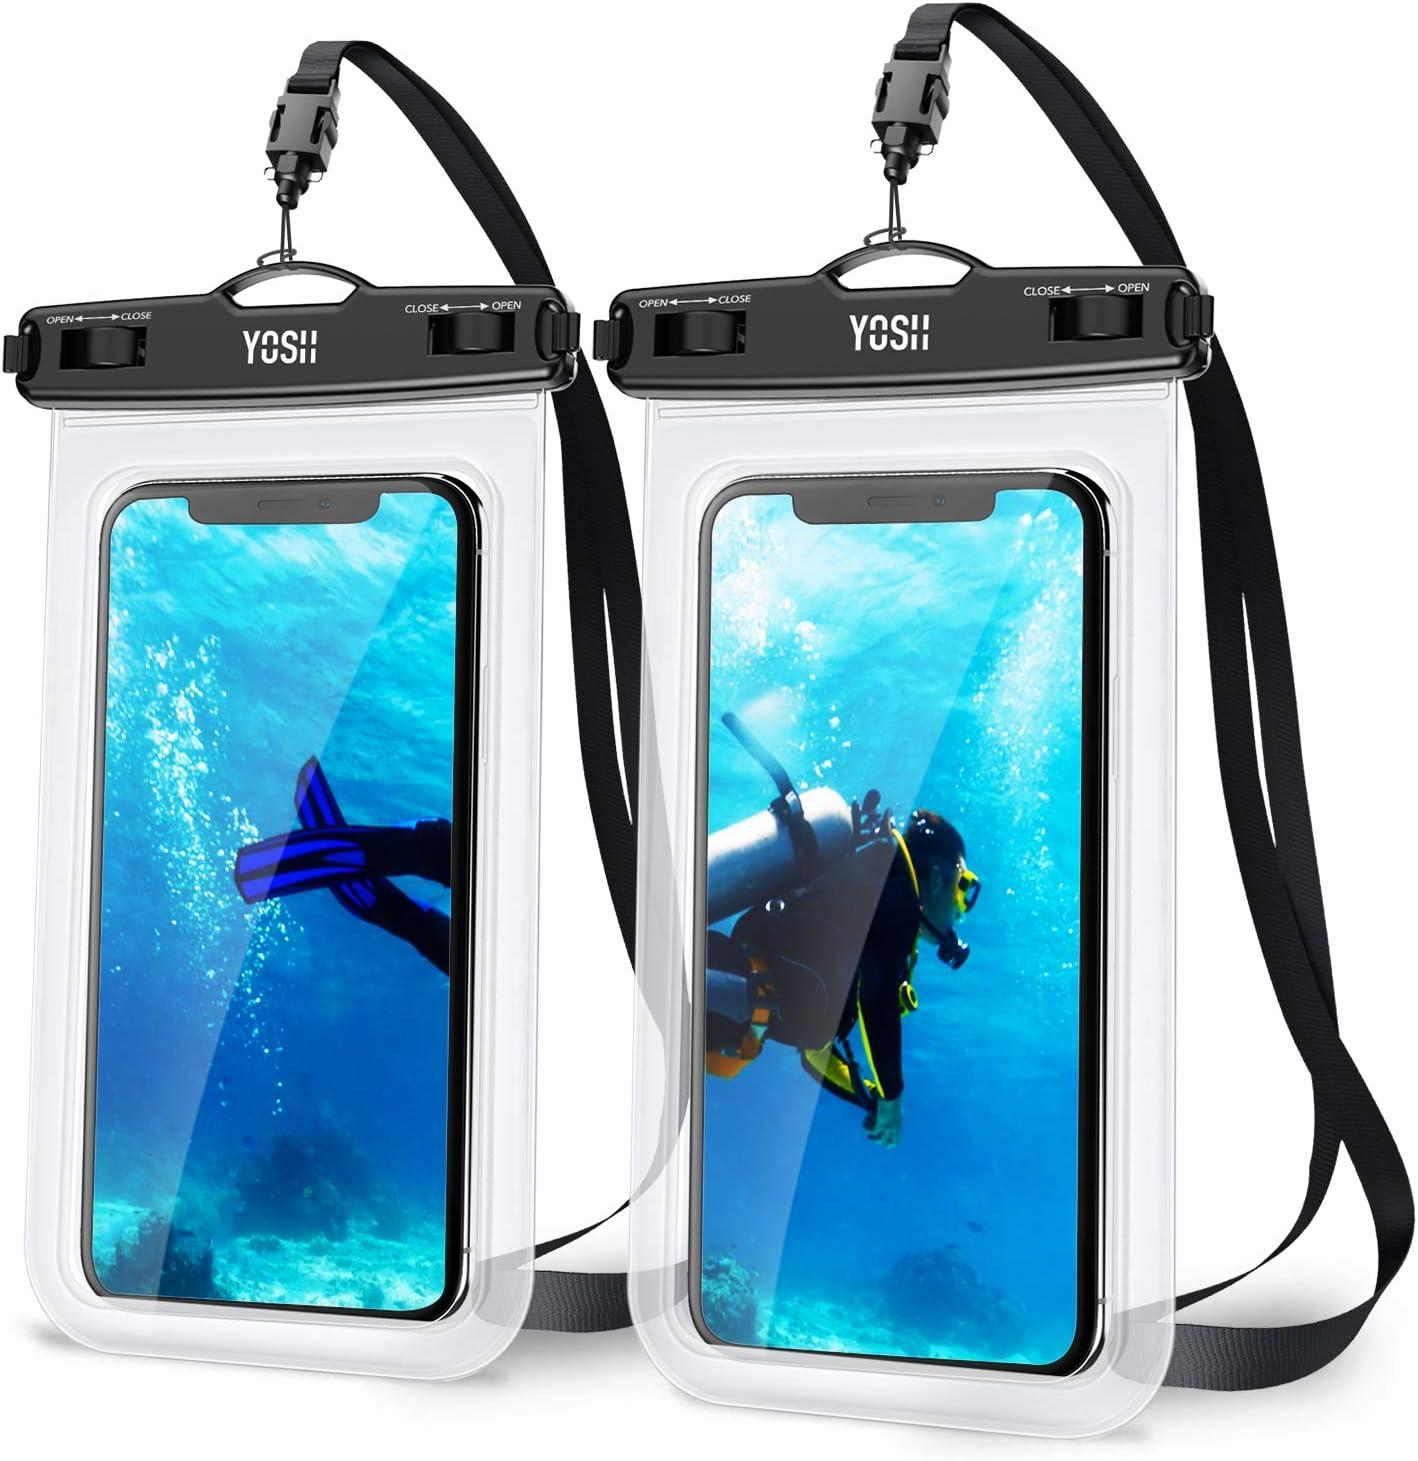 YOSH Funda Impermeable Móvil IPX8 Universal 2 Unidades, Bolsa para Móvil Estanca a Prueba de Agua para iPhone 12 Pro MAX 11 XR X 8 7 Galaxy Note 20 S20 Xiaomi Poco X3 Huawei Mate40 Pro hasta 7''